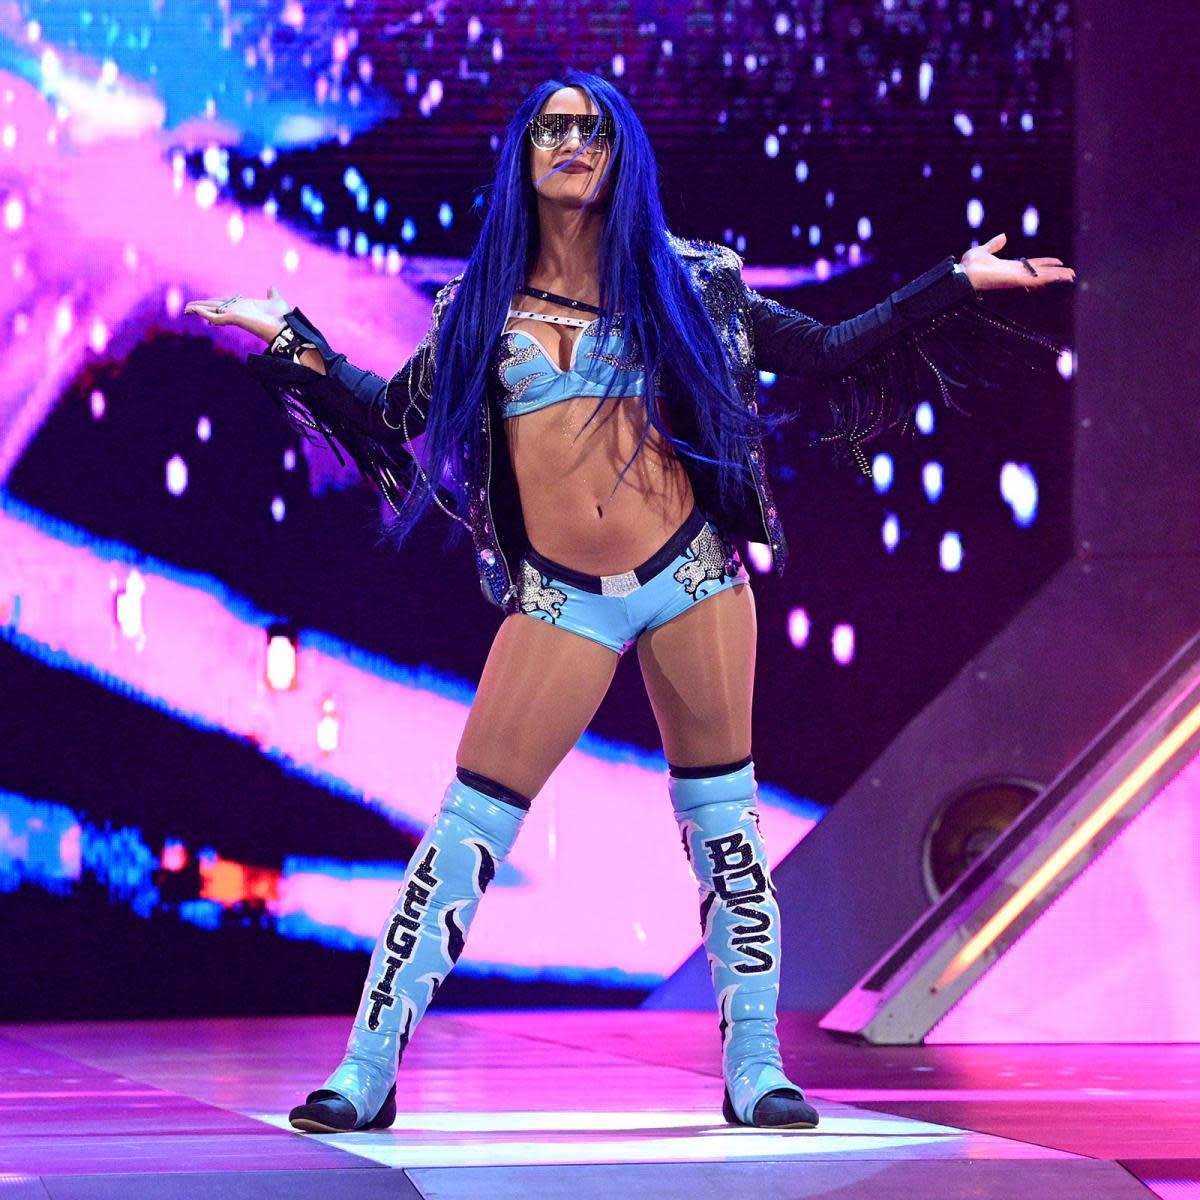 Sasha Banks Advertised To Return On This Week's WWE Smackdown 2